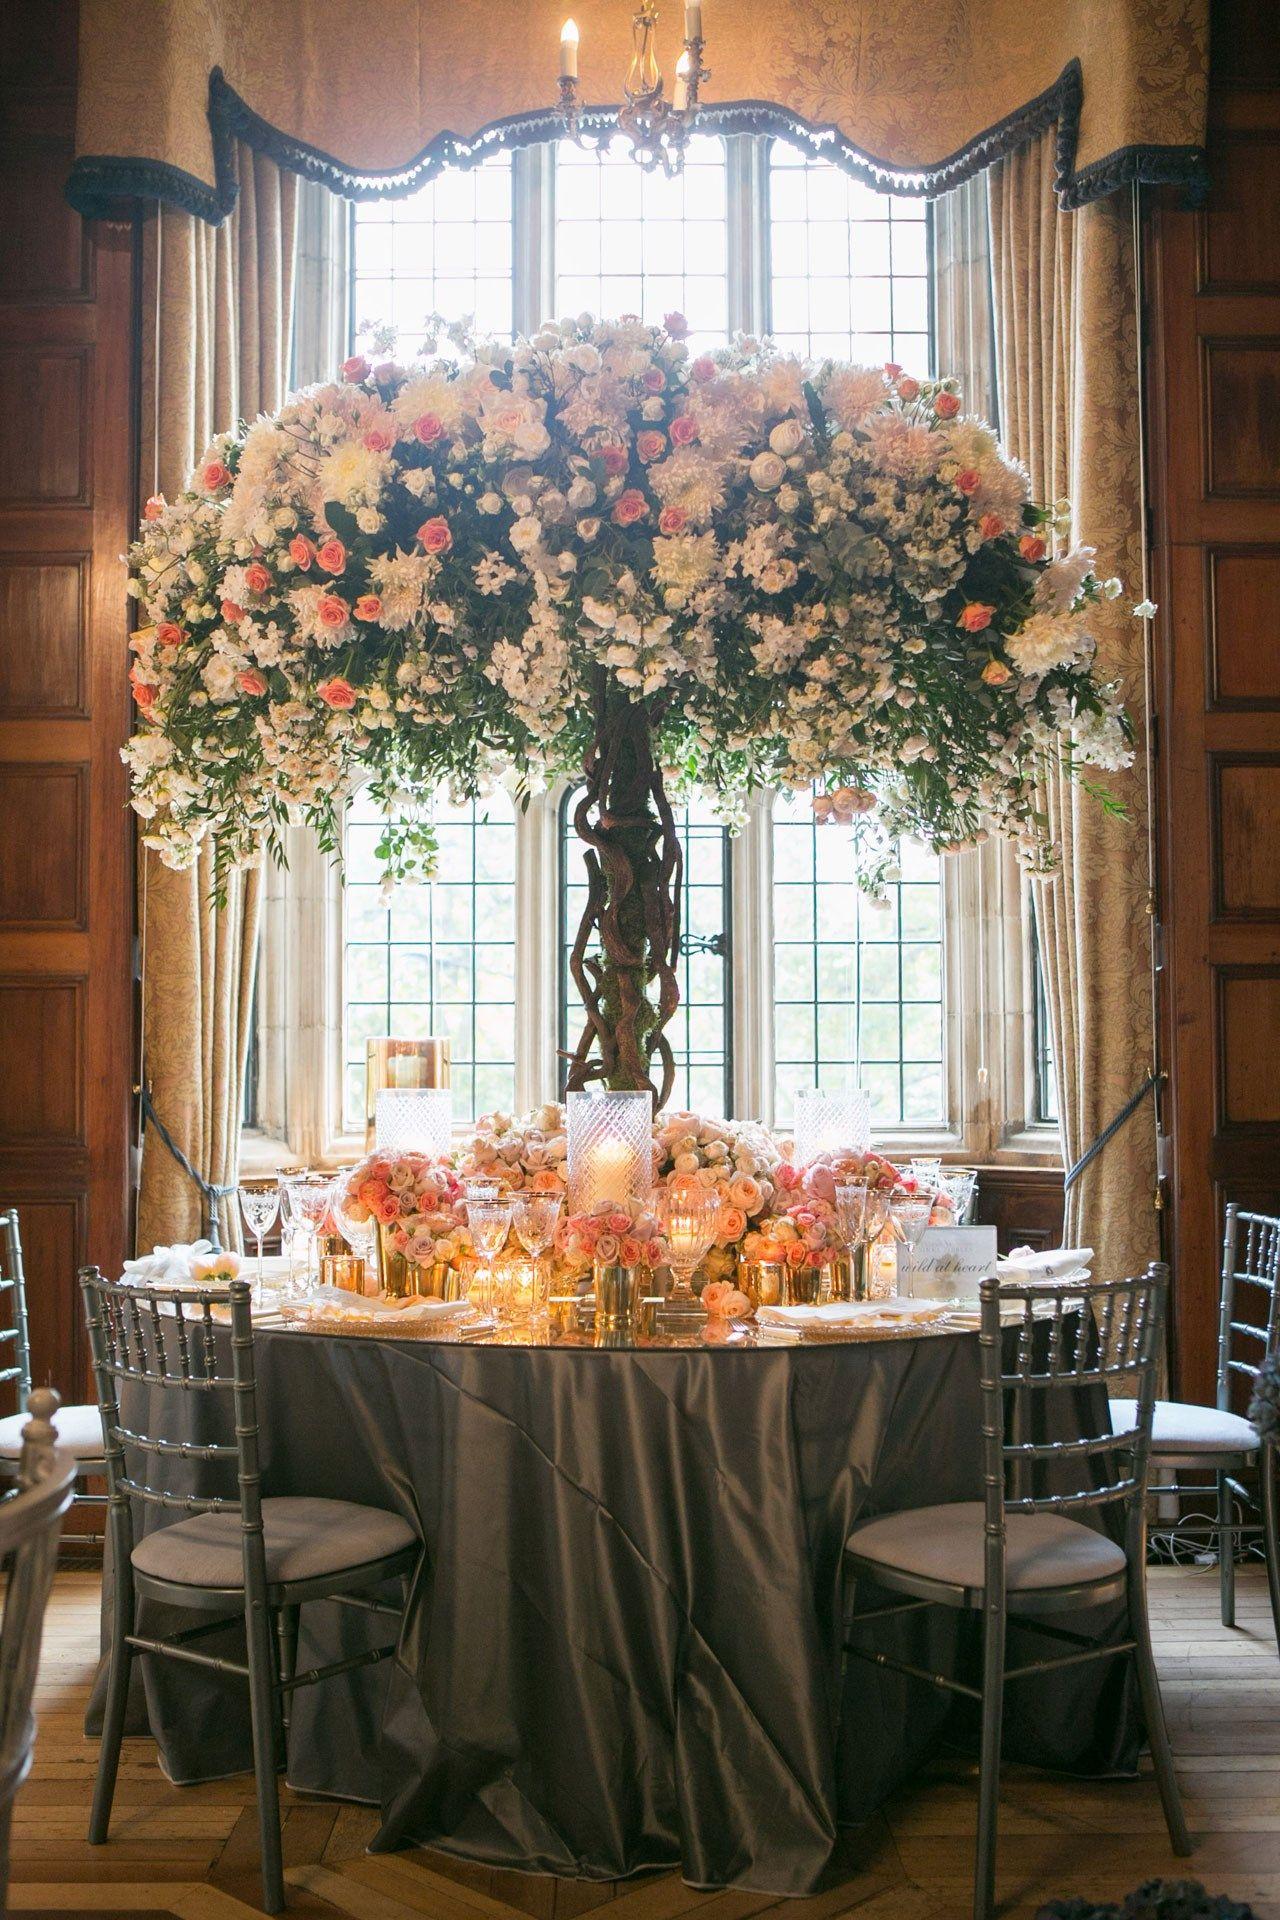 How To Plan The Ultimate English Wedding Tree wedding